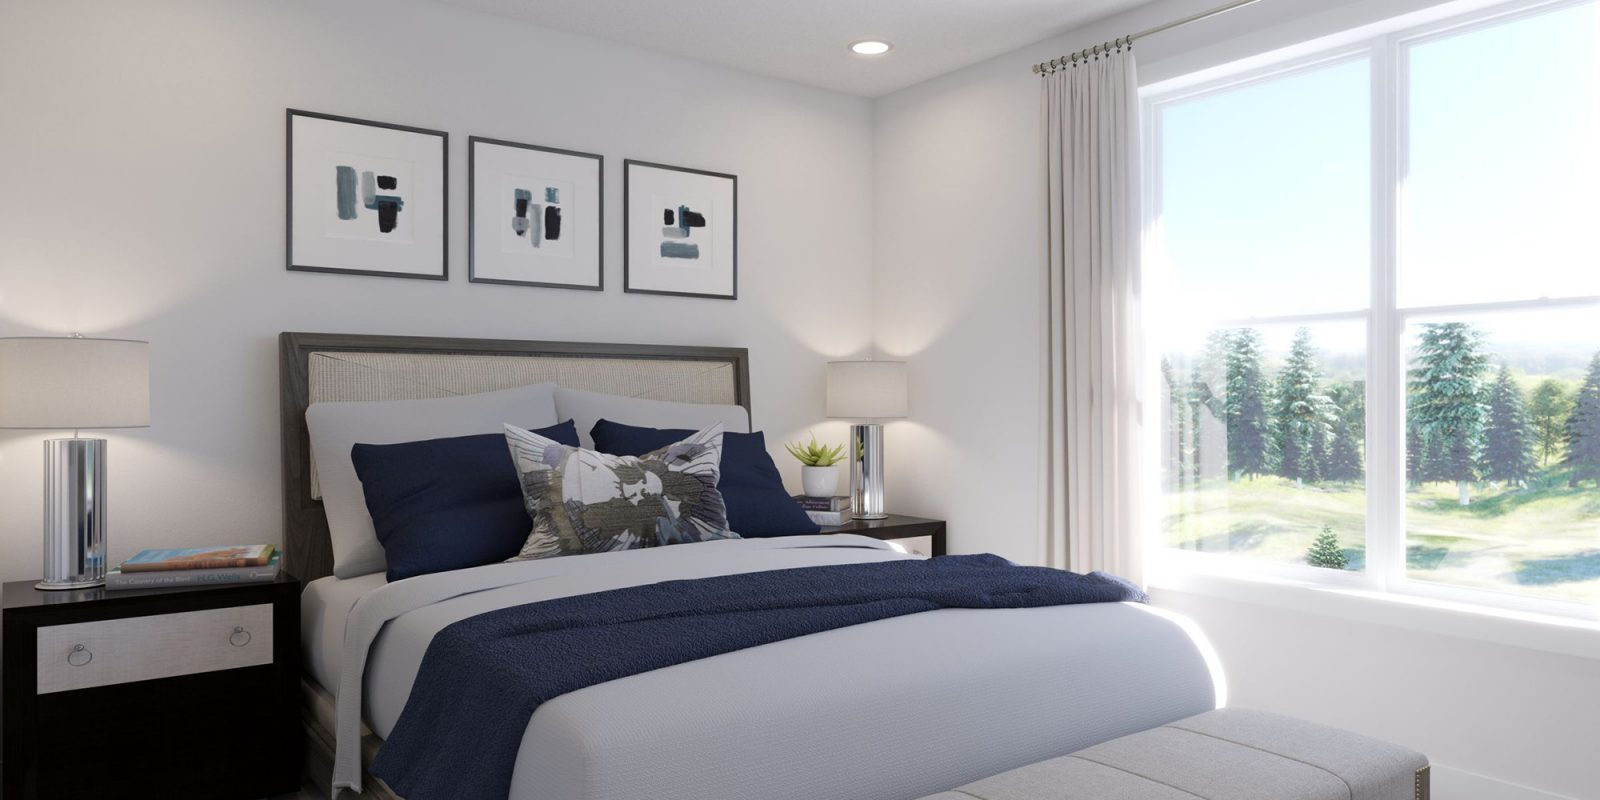 Baseline DoMore Rows: Oasis - Master Bedroom